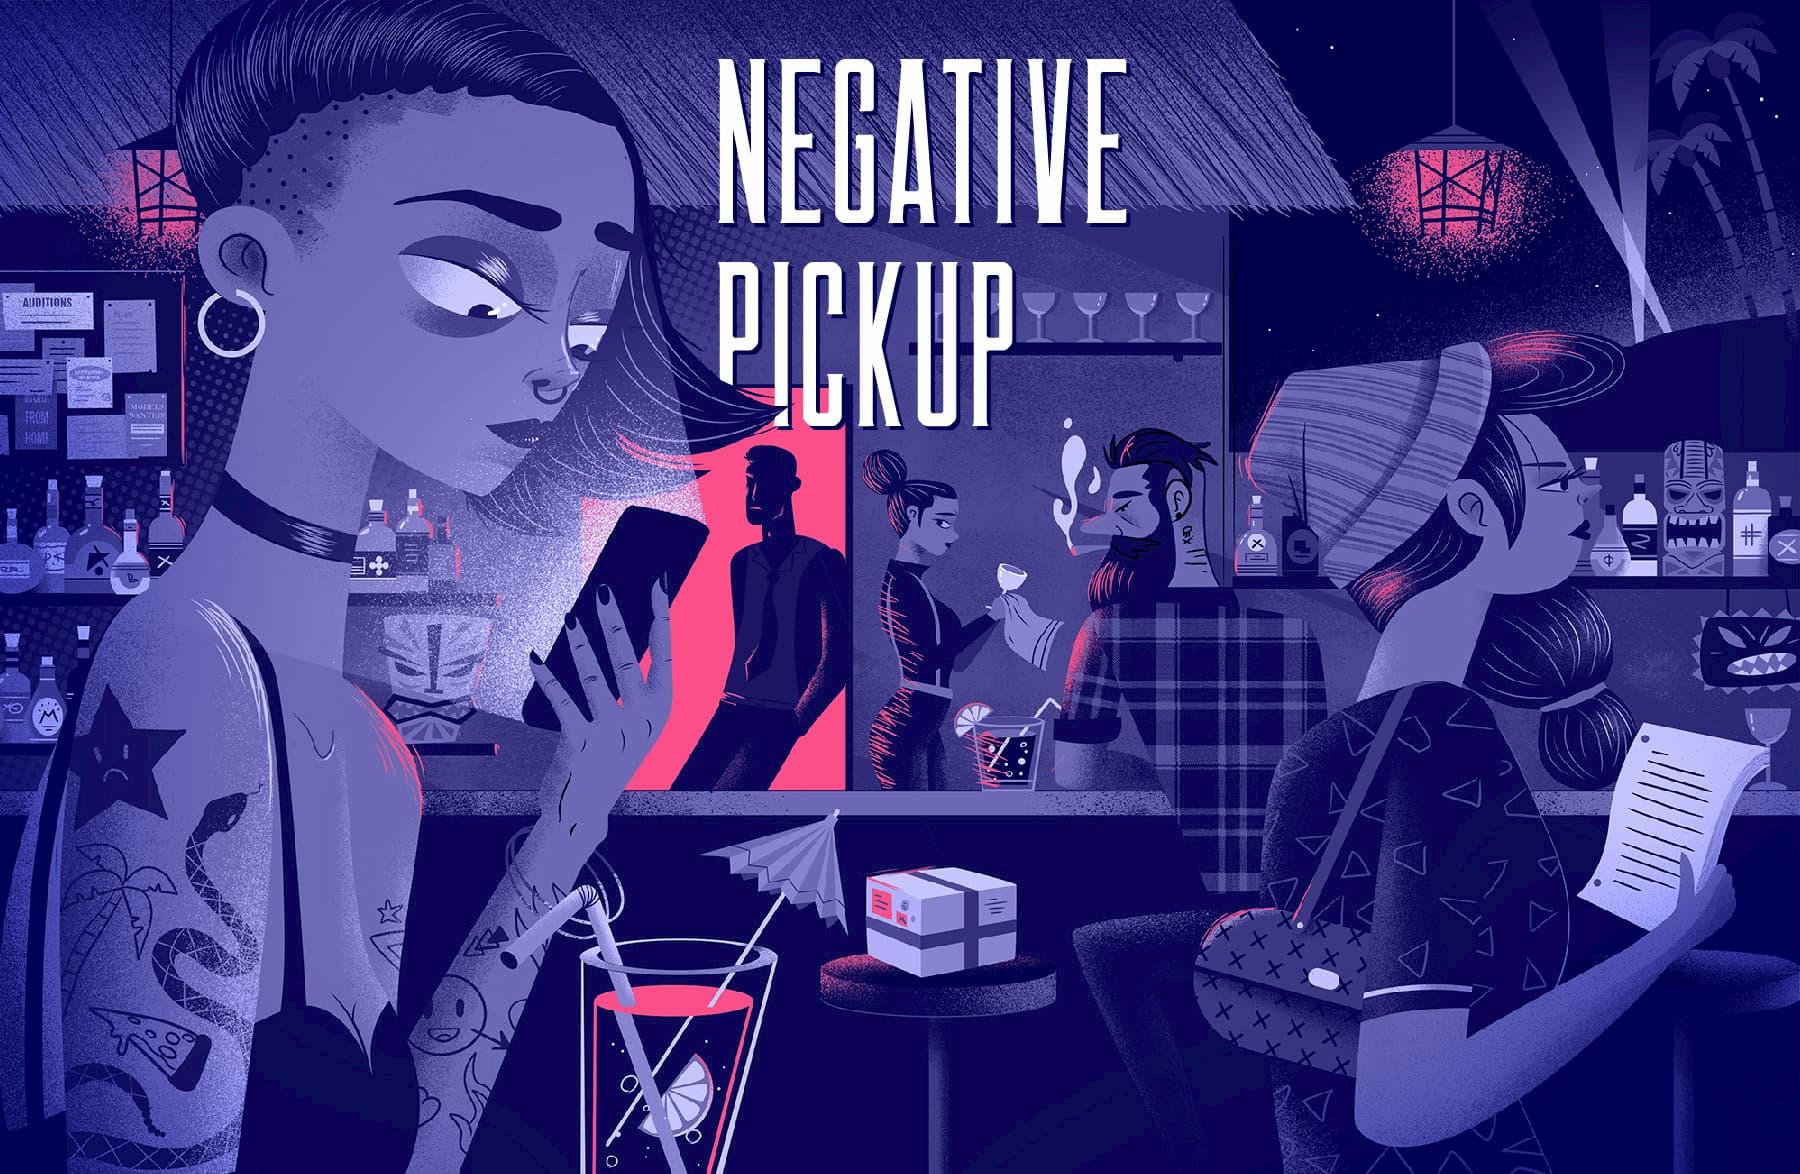 Negative Pickup